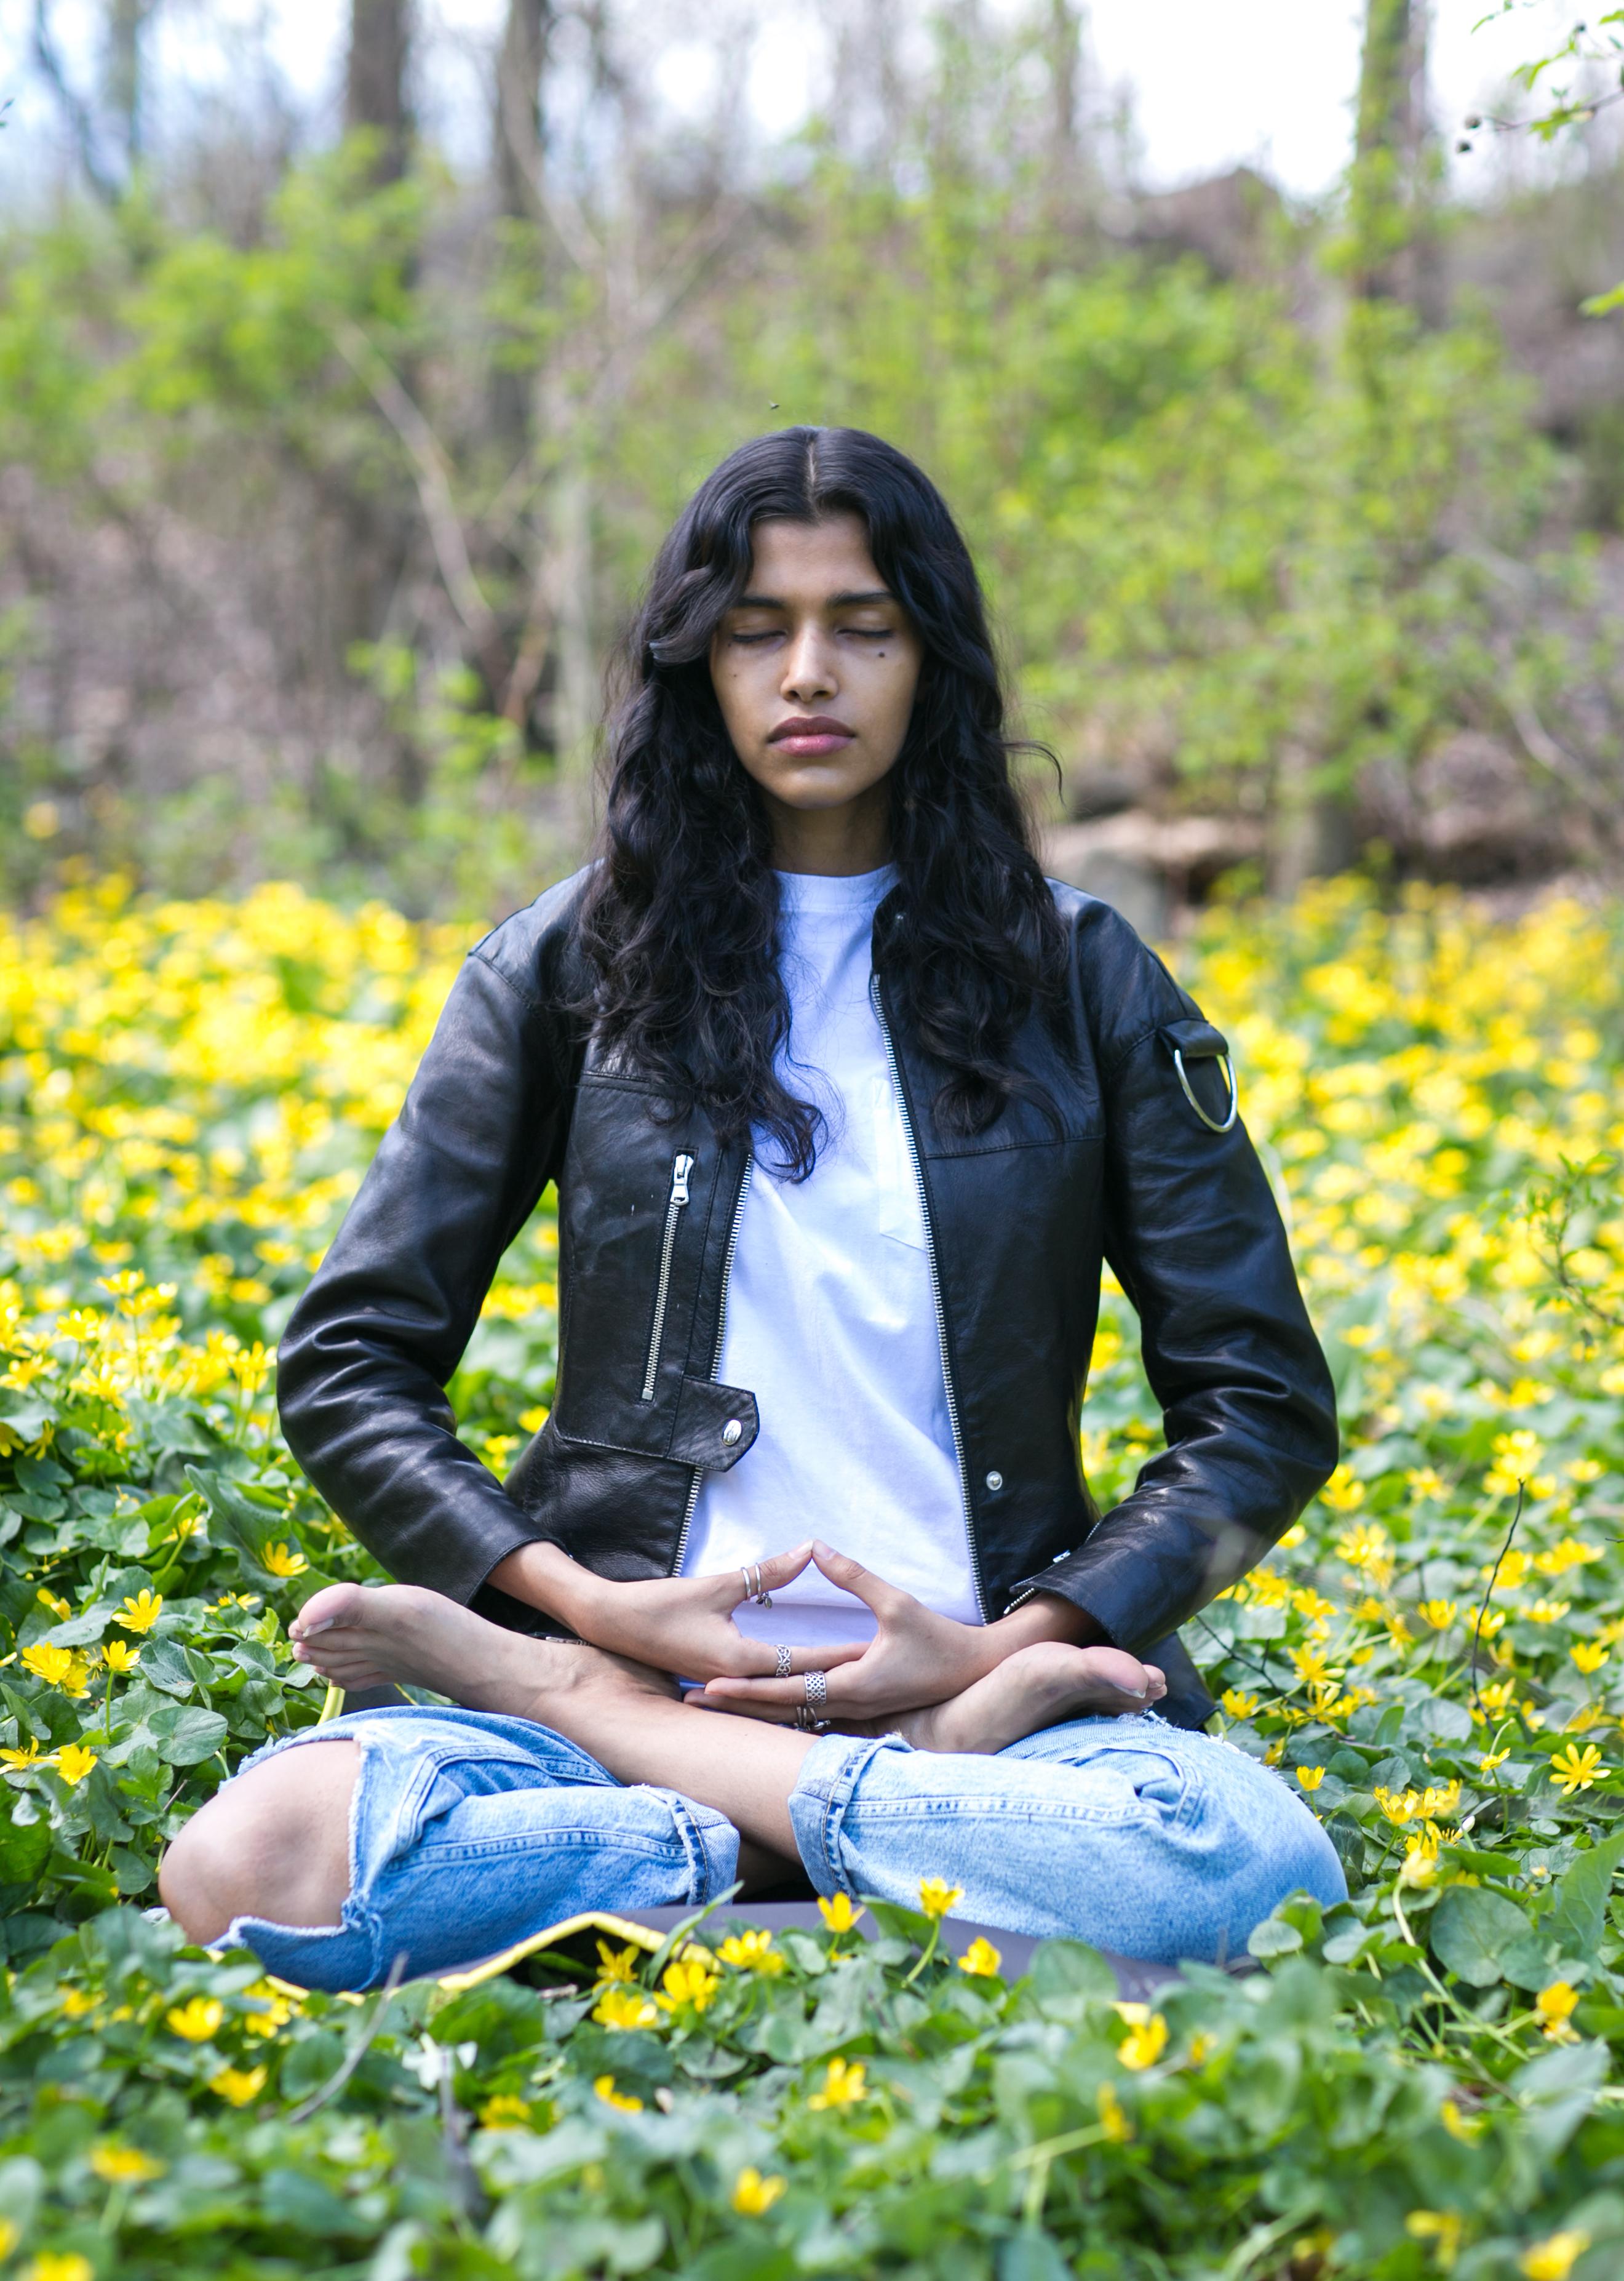 O modelo Pooja Mor medita no Central Park, em 19 de abril de 2016 (La Gran Época | Benjamin Chasteen)